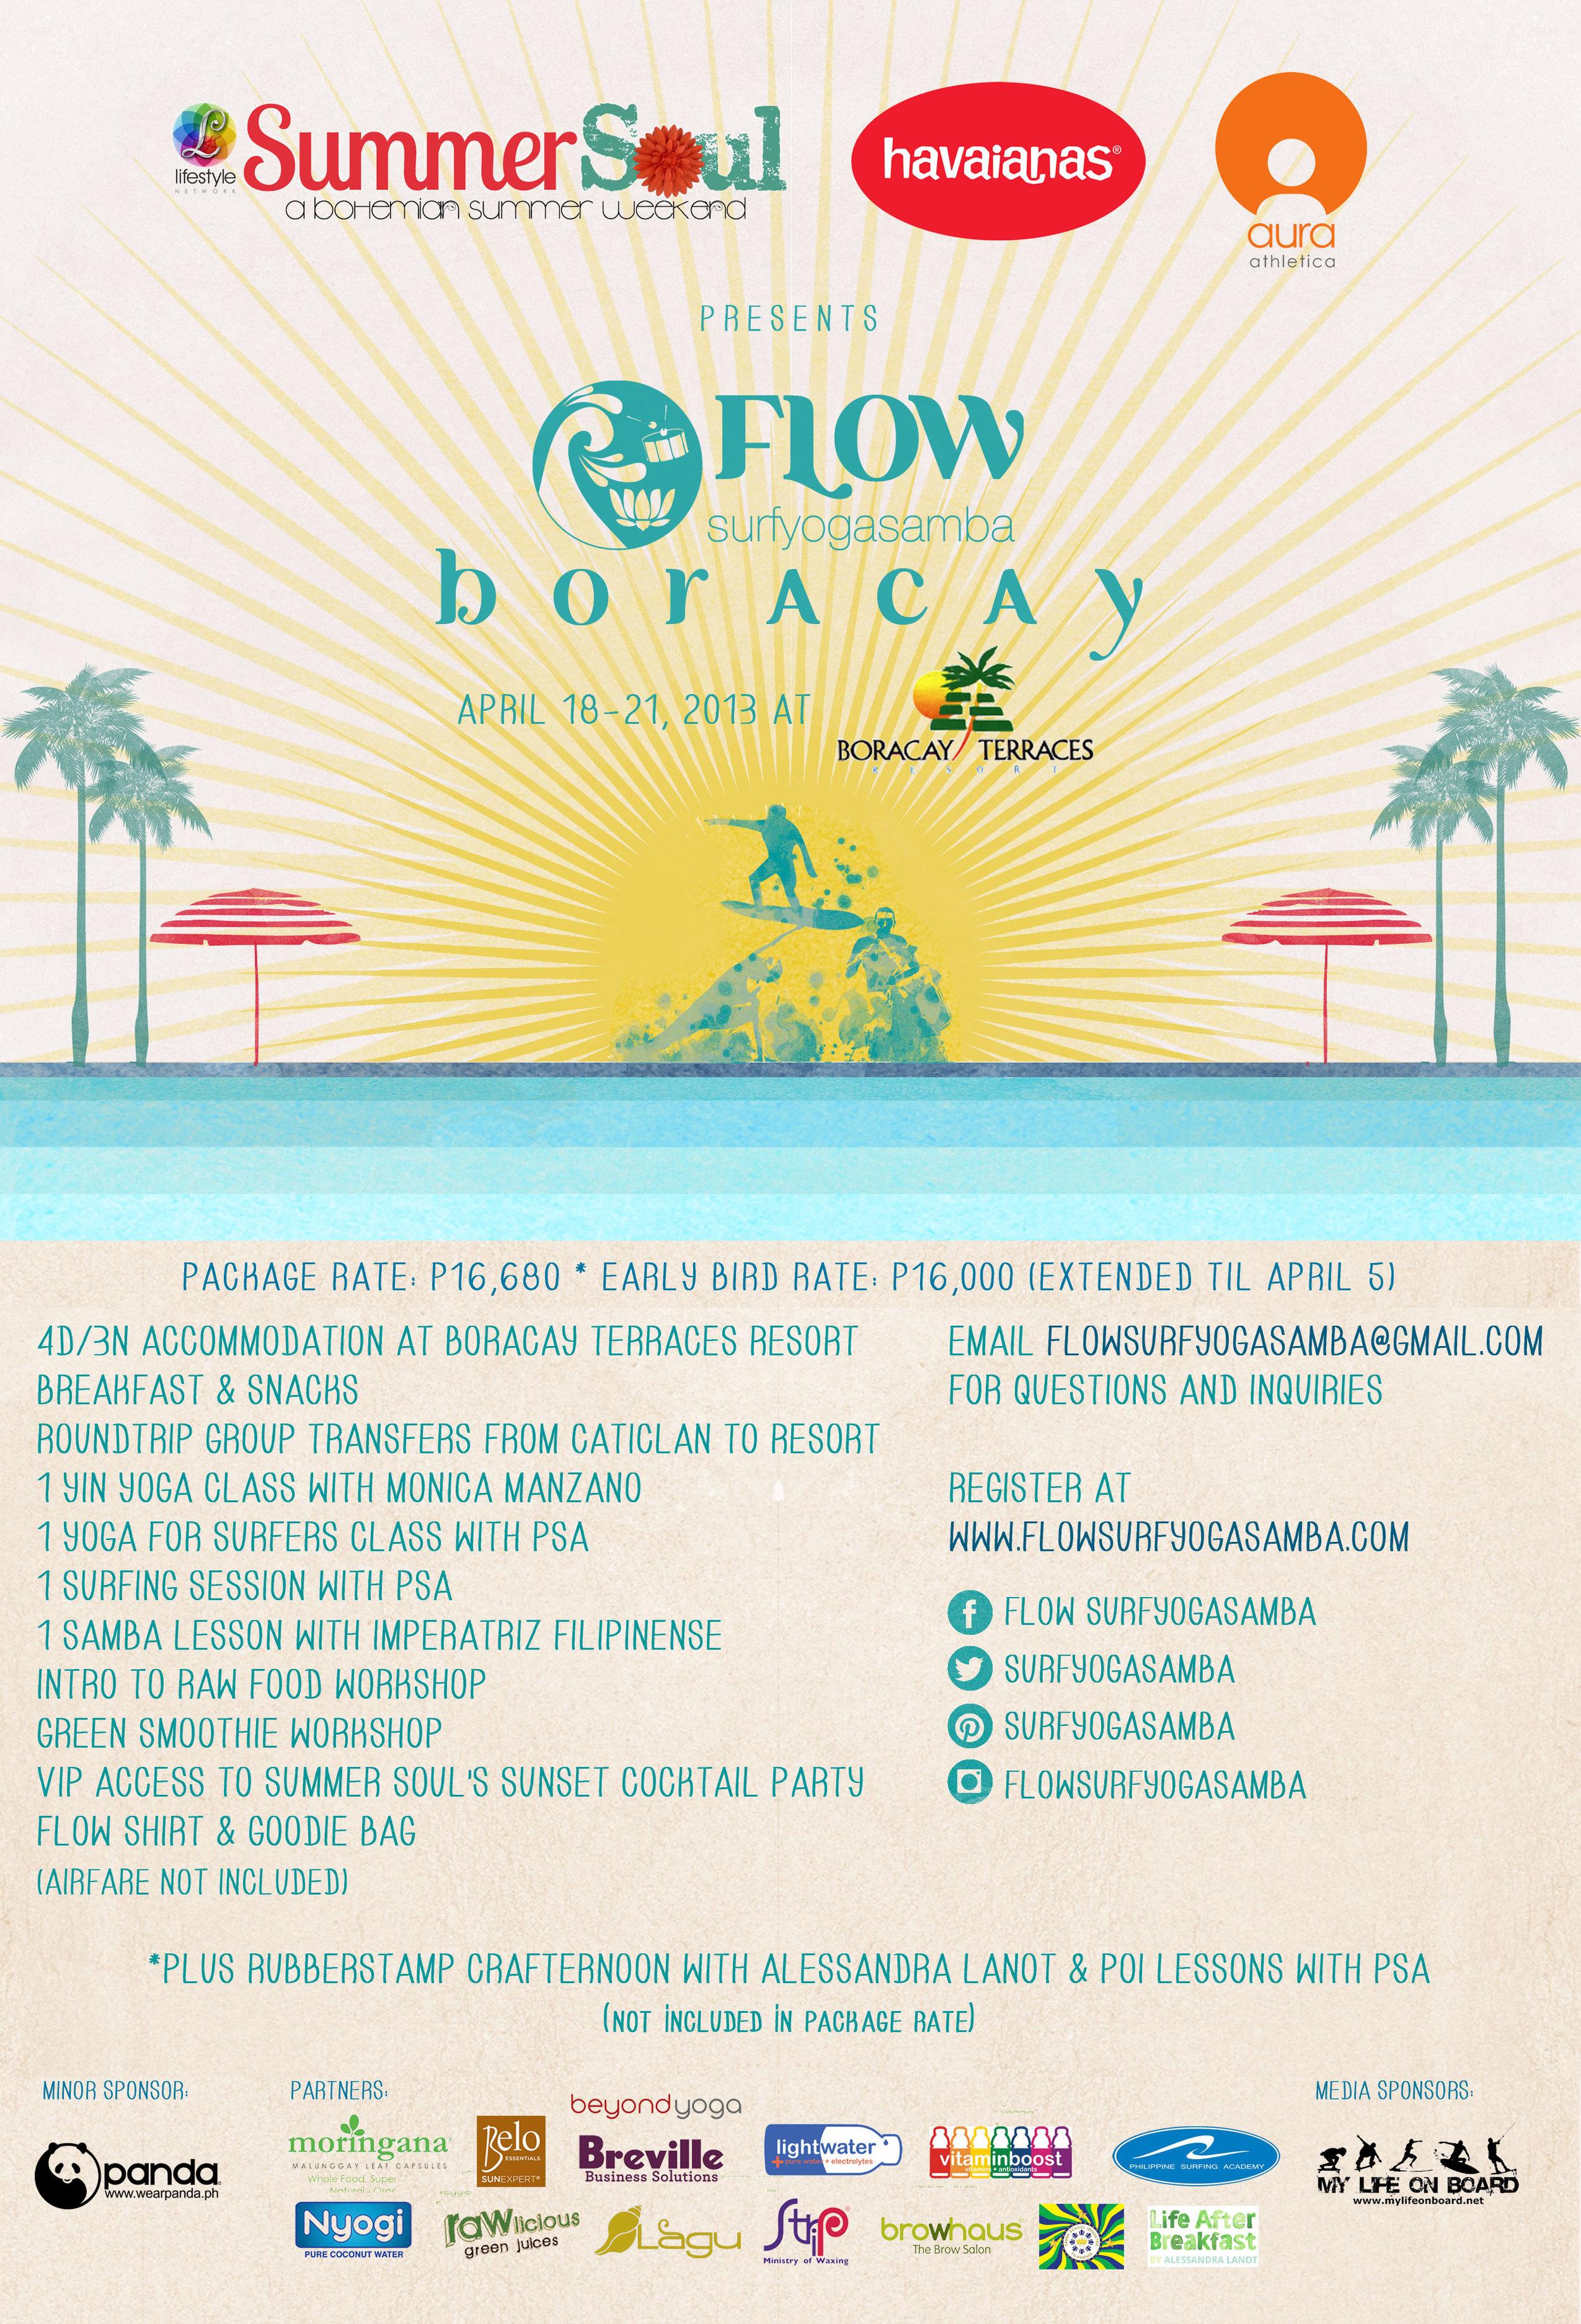 Flow-Boracay-Poster.jpg